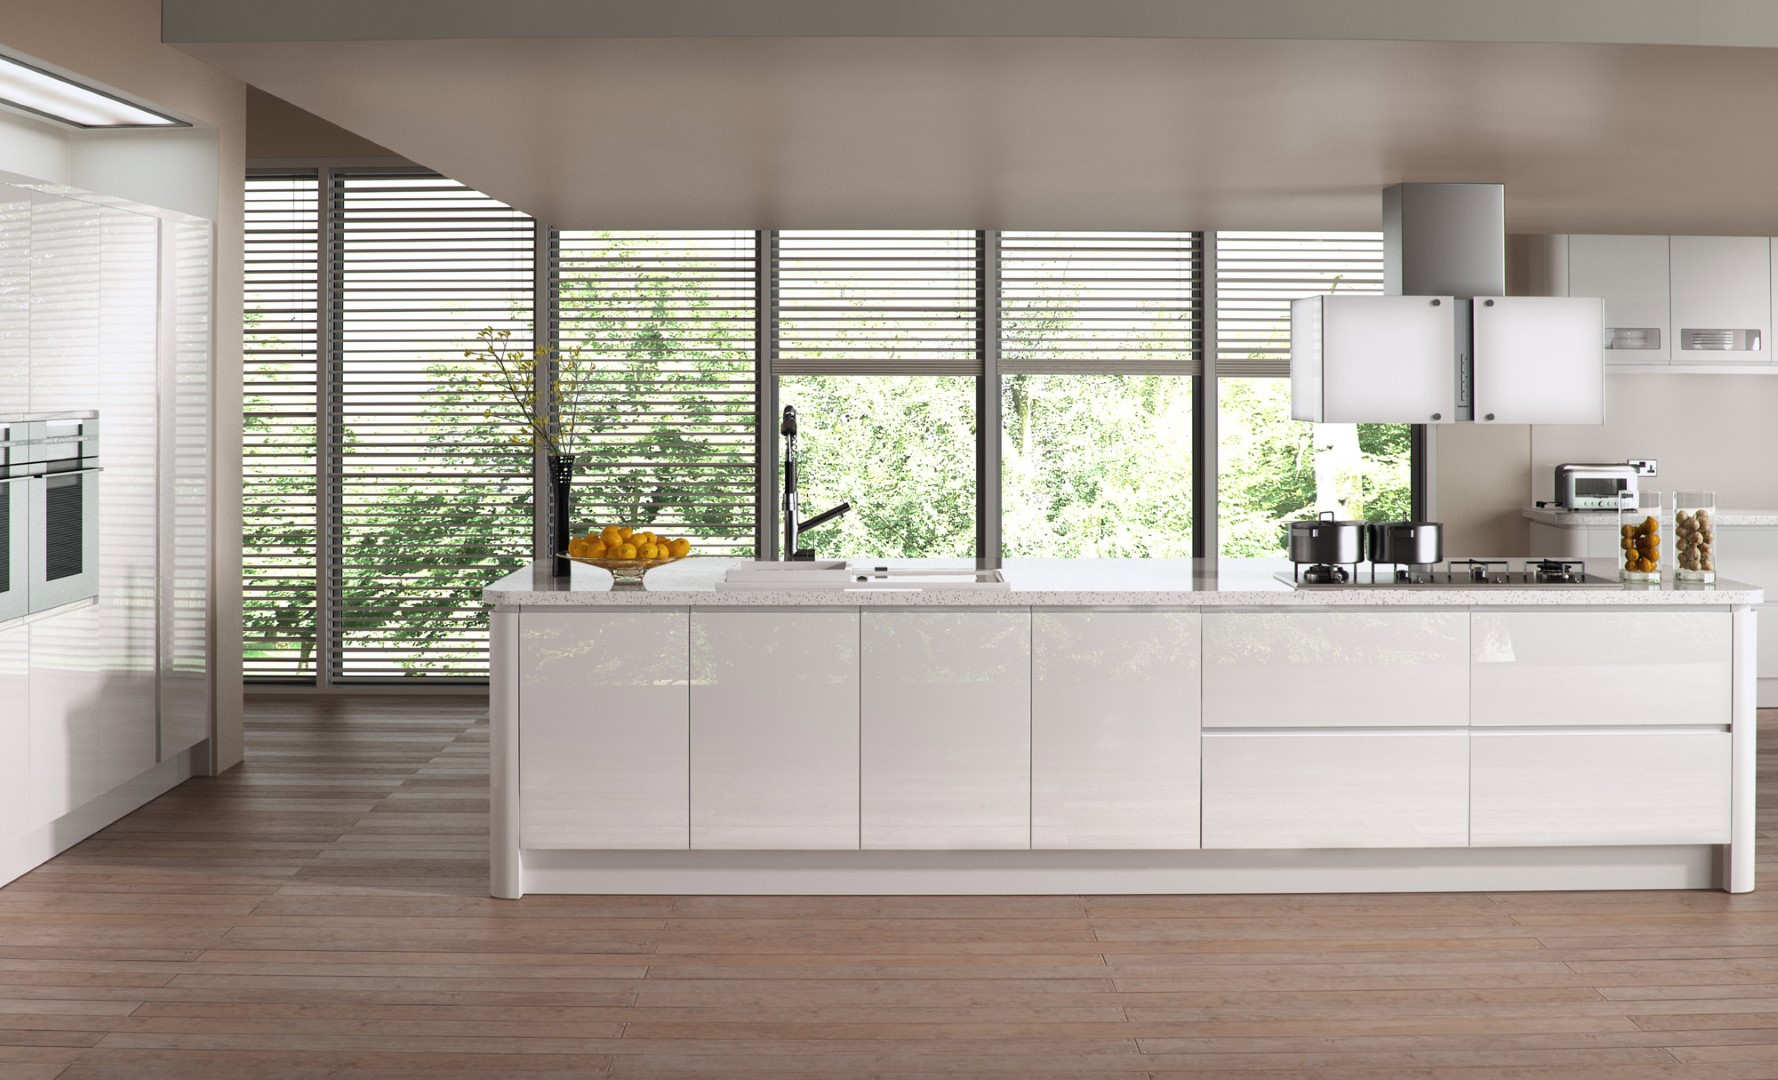 Modern Contemporary High Gloss Kitchen - Strada Gloss White Kitchen - Kitchen Design - Alan Kelly Kitchens - Waterford